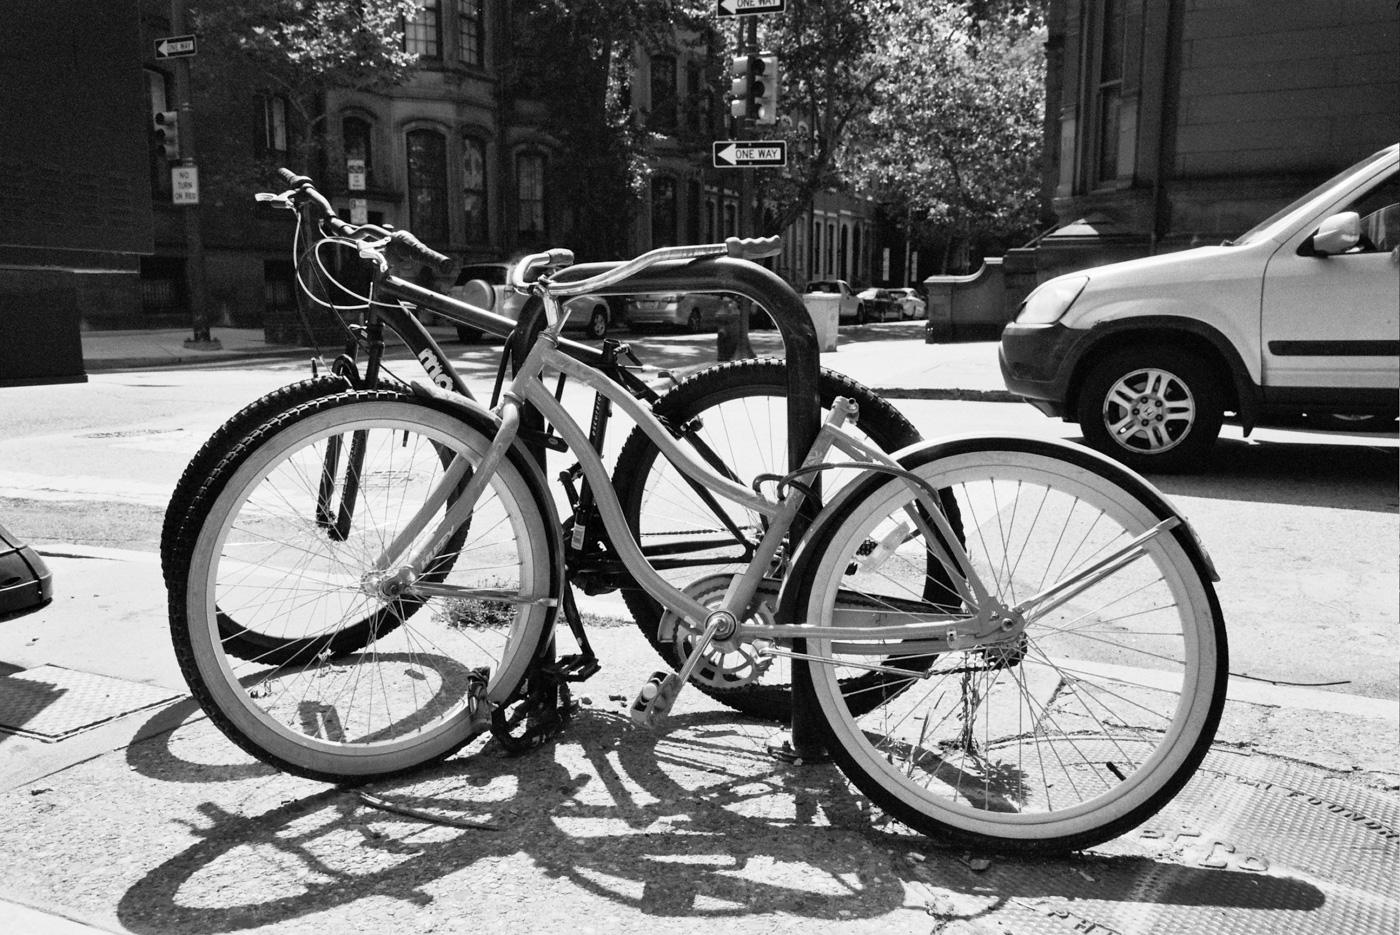 Two Bikes but No Seats